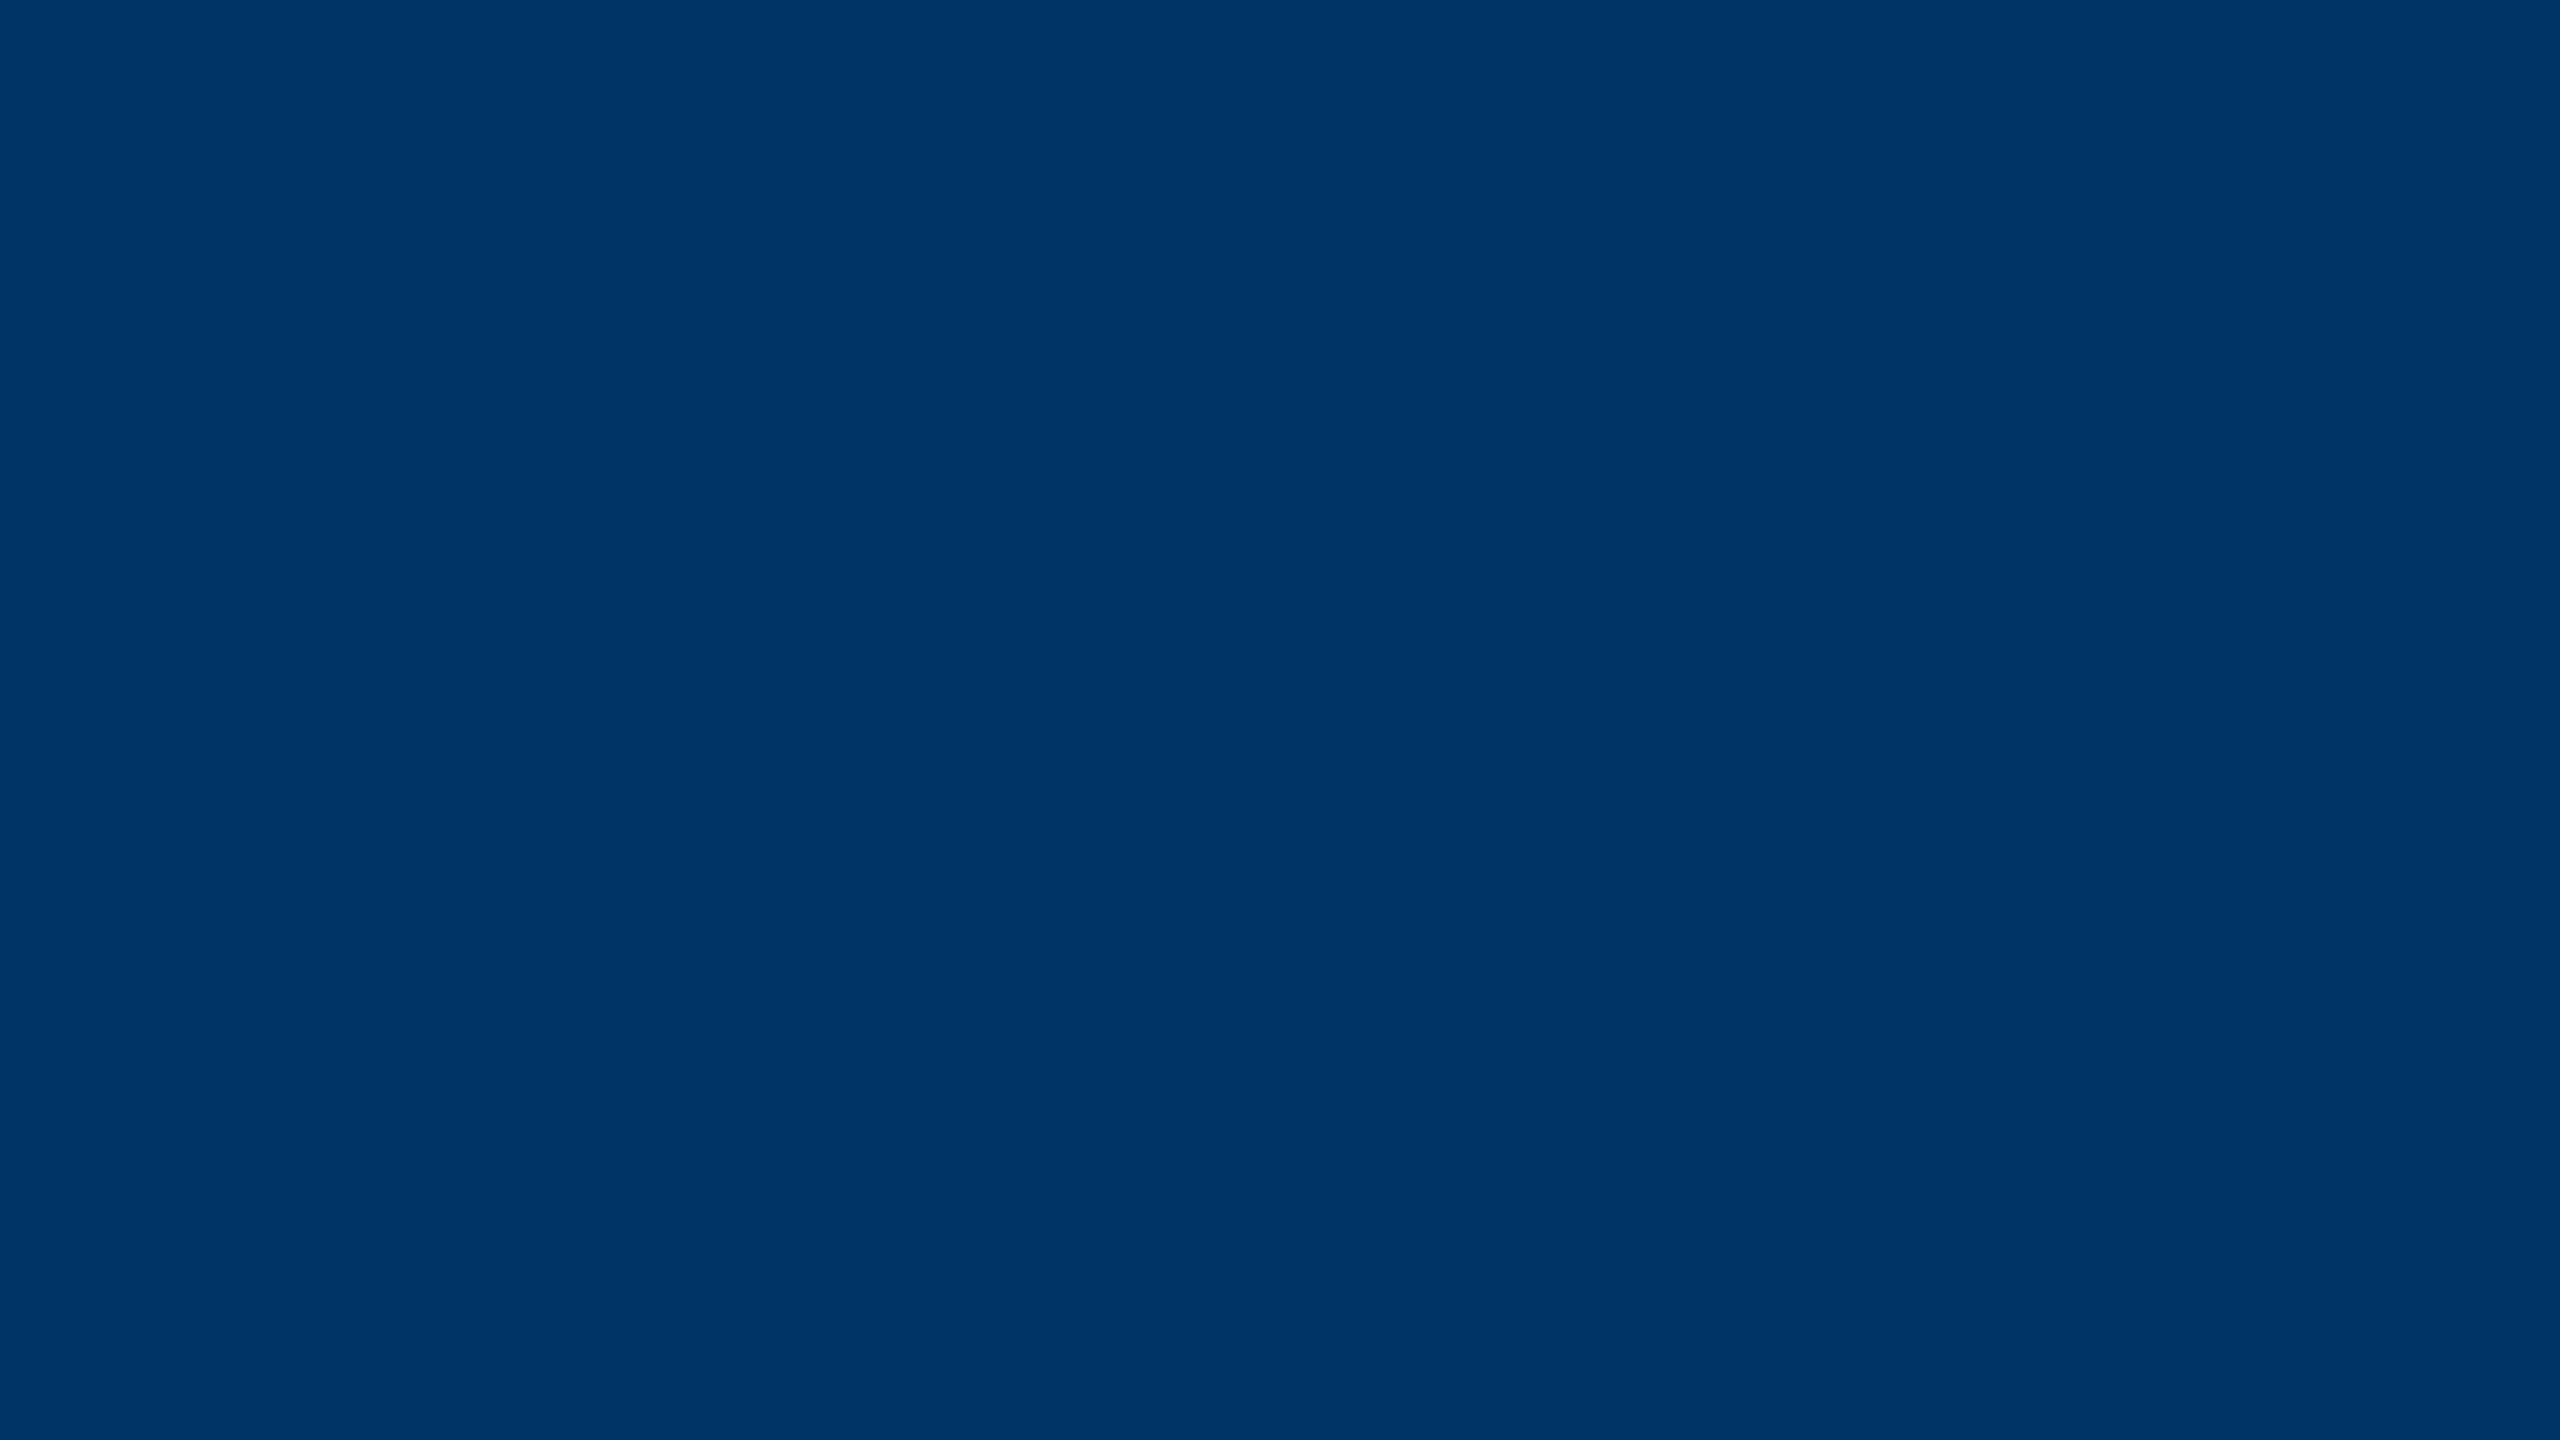 Navy Blue Background 2560x1440